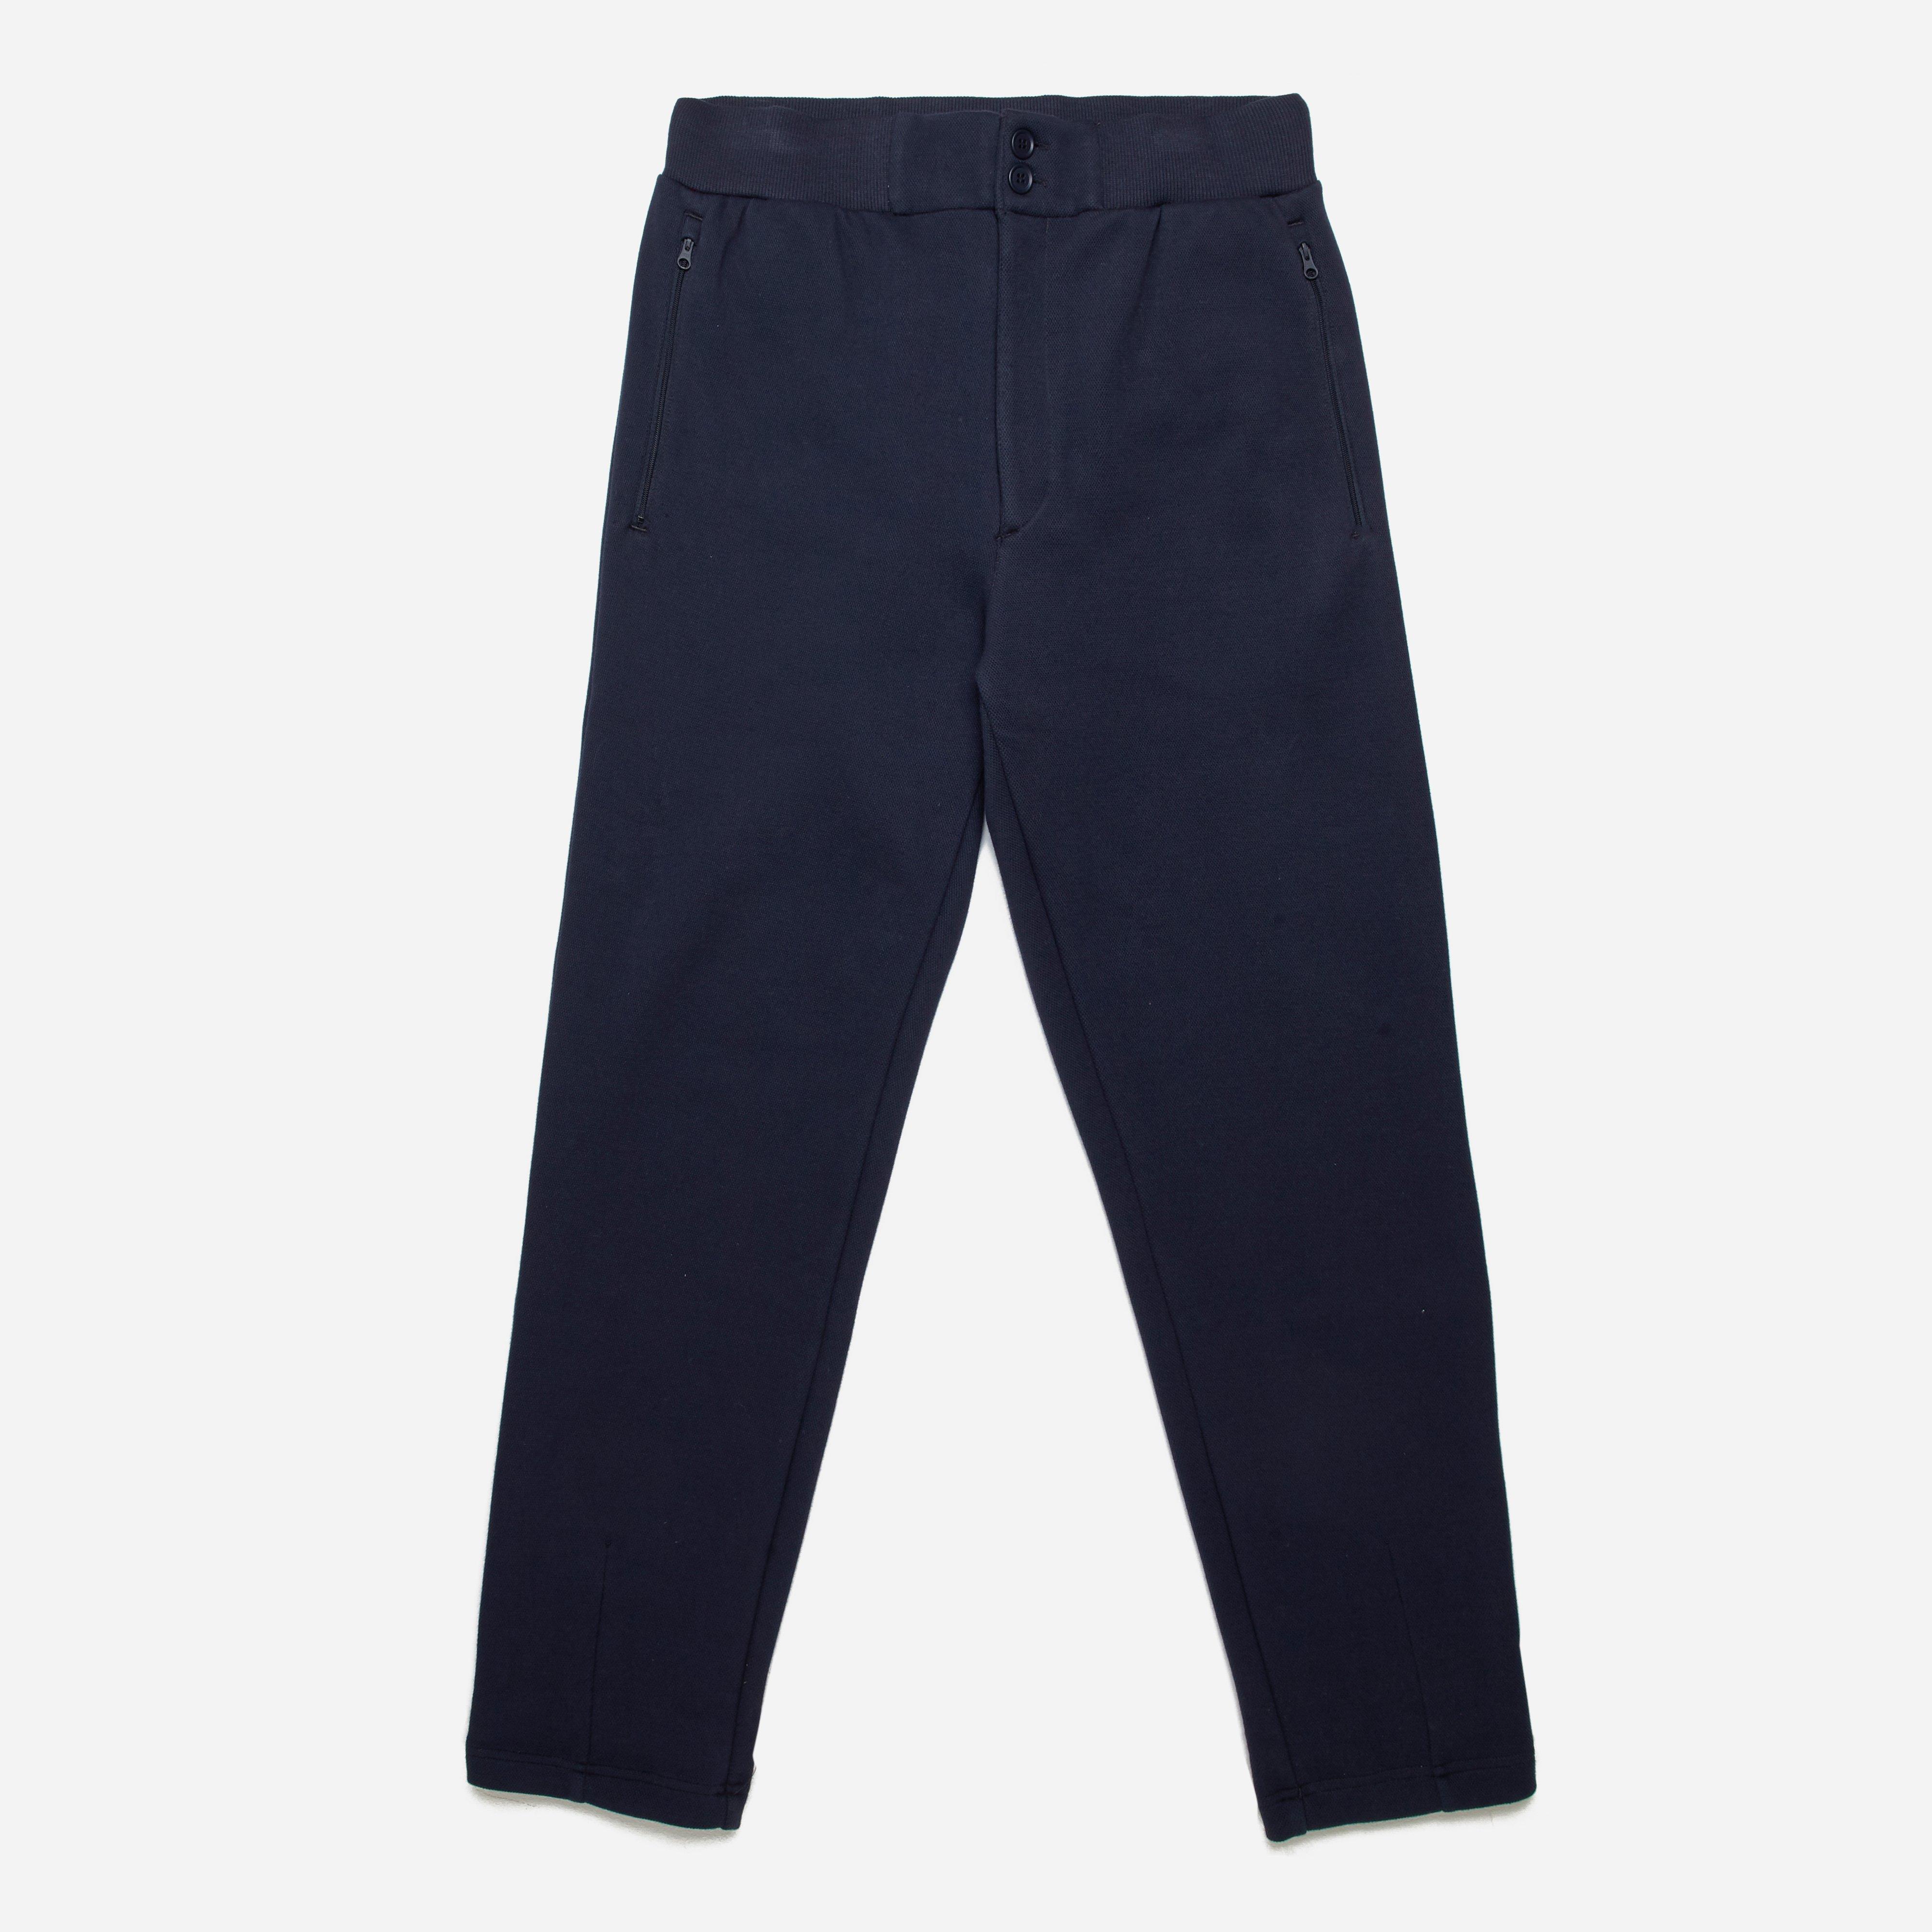 adidas Originals Beckenbauer Track Pants SPZL